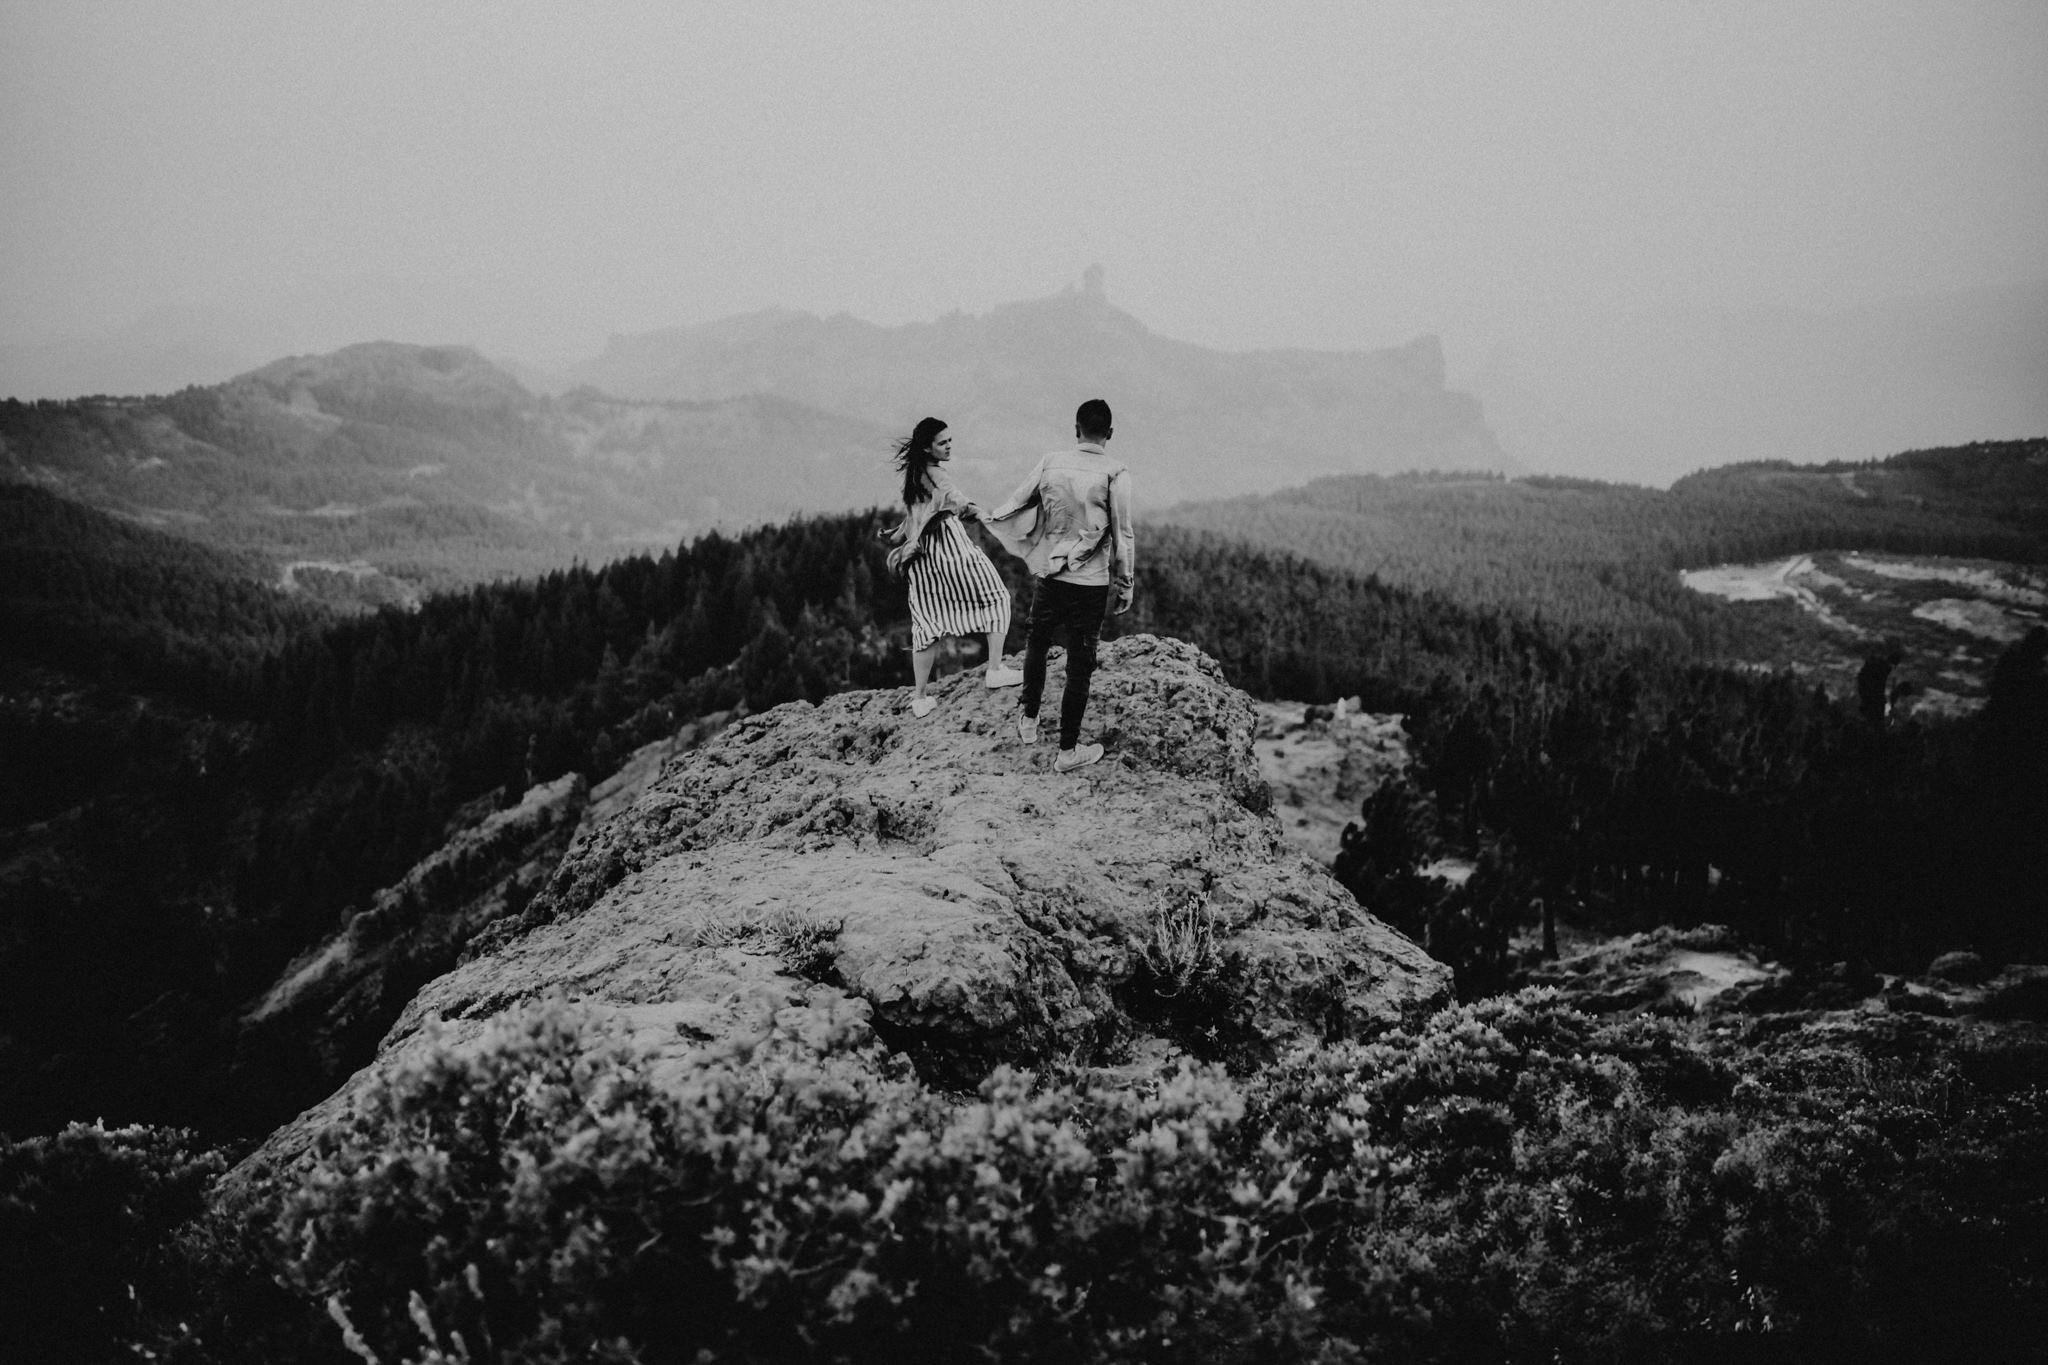 spanish-wedding-photographer-donmashelen-5